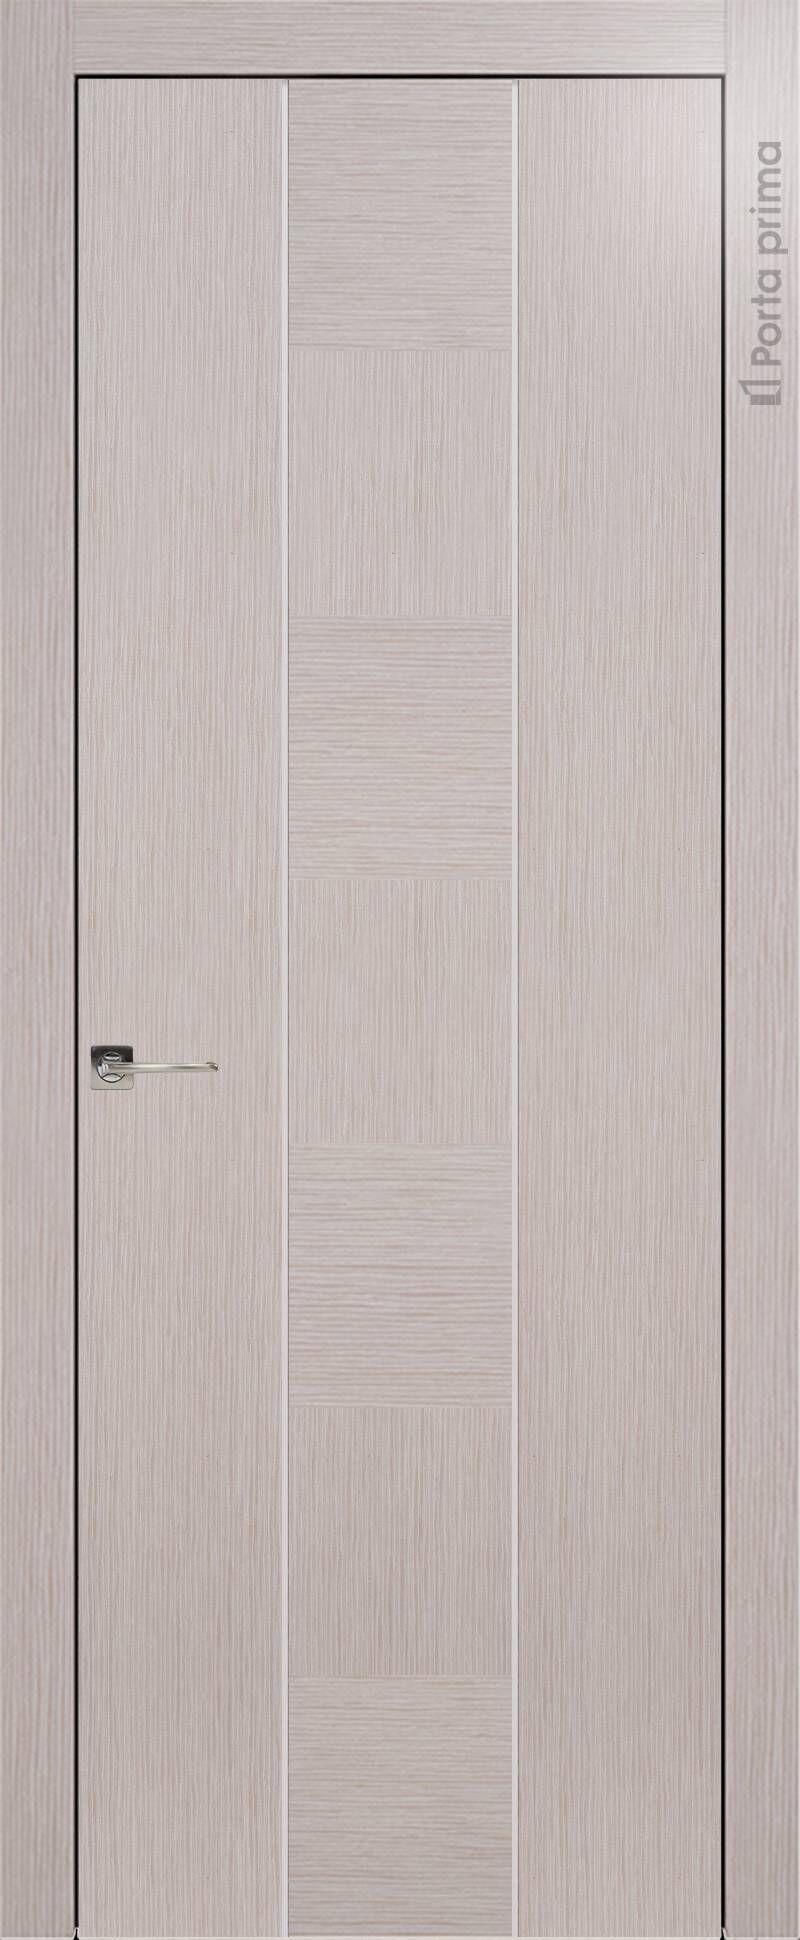 Tivoli Б-1 цвет - Дымчатый дуб Без стекла (ДГ)